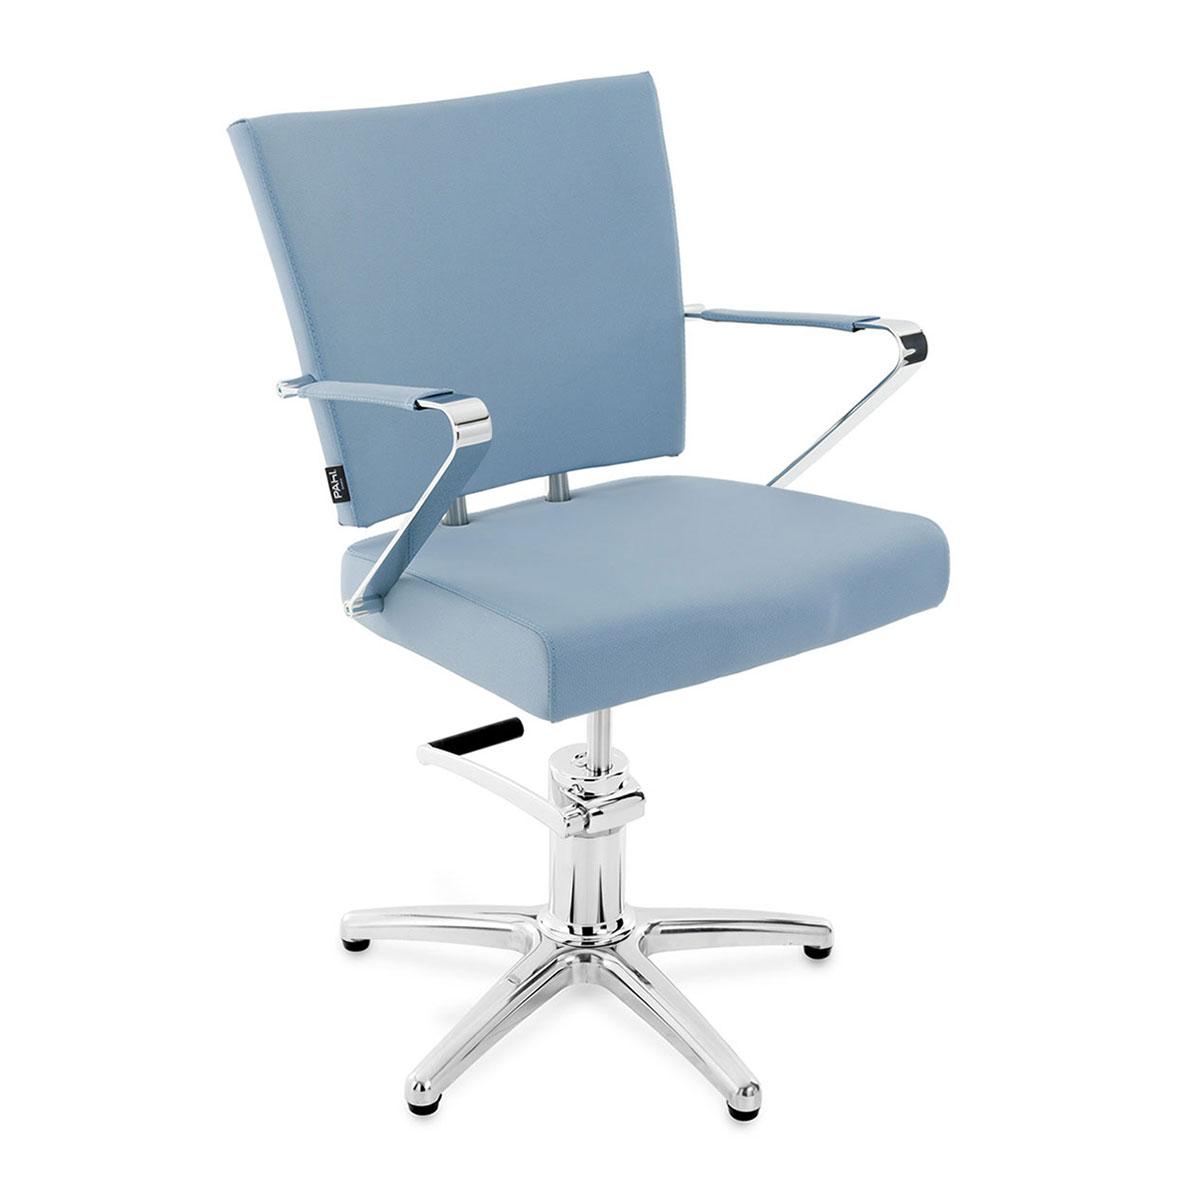 mitas fauteuil de coiffure mobicoiff. Black Bedroom Furniture Sets. Home Design Ideas